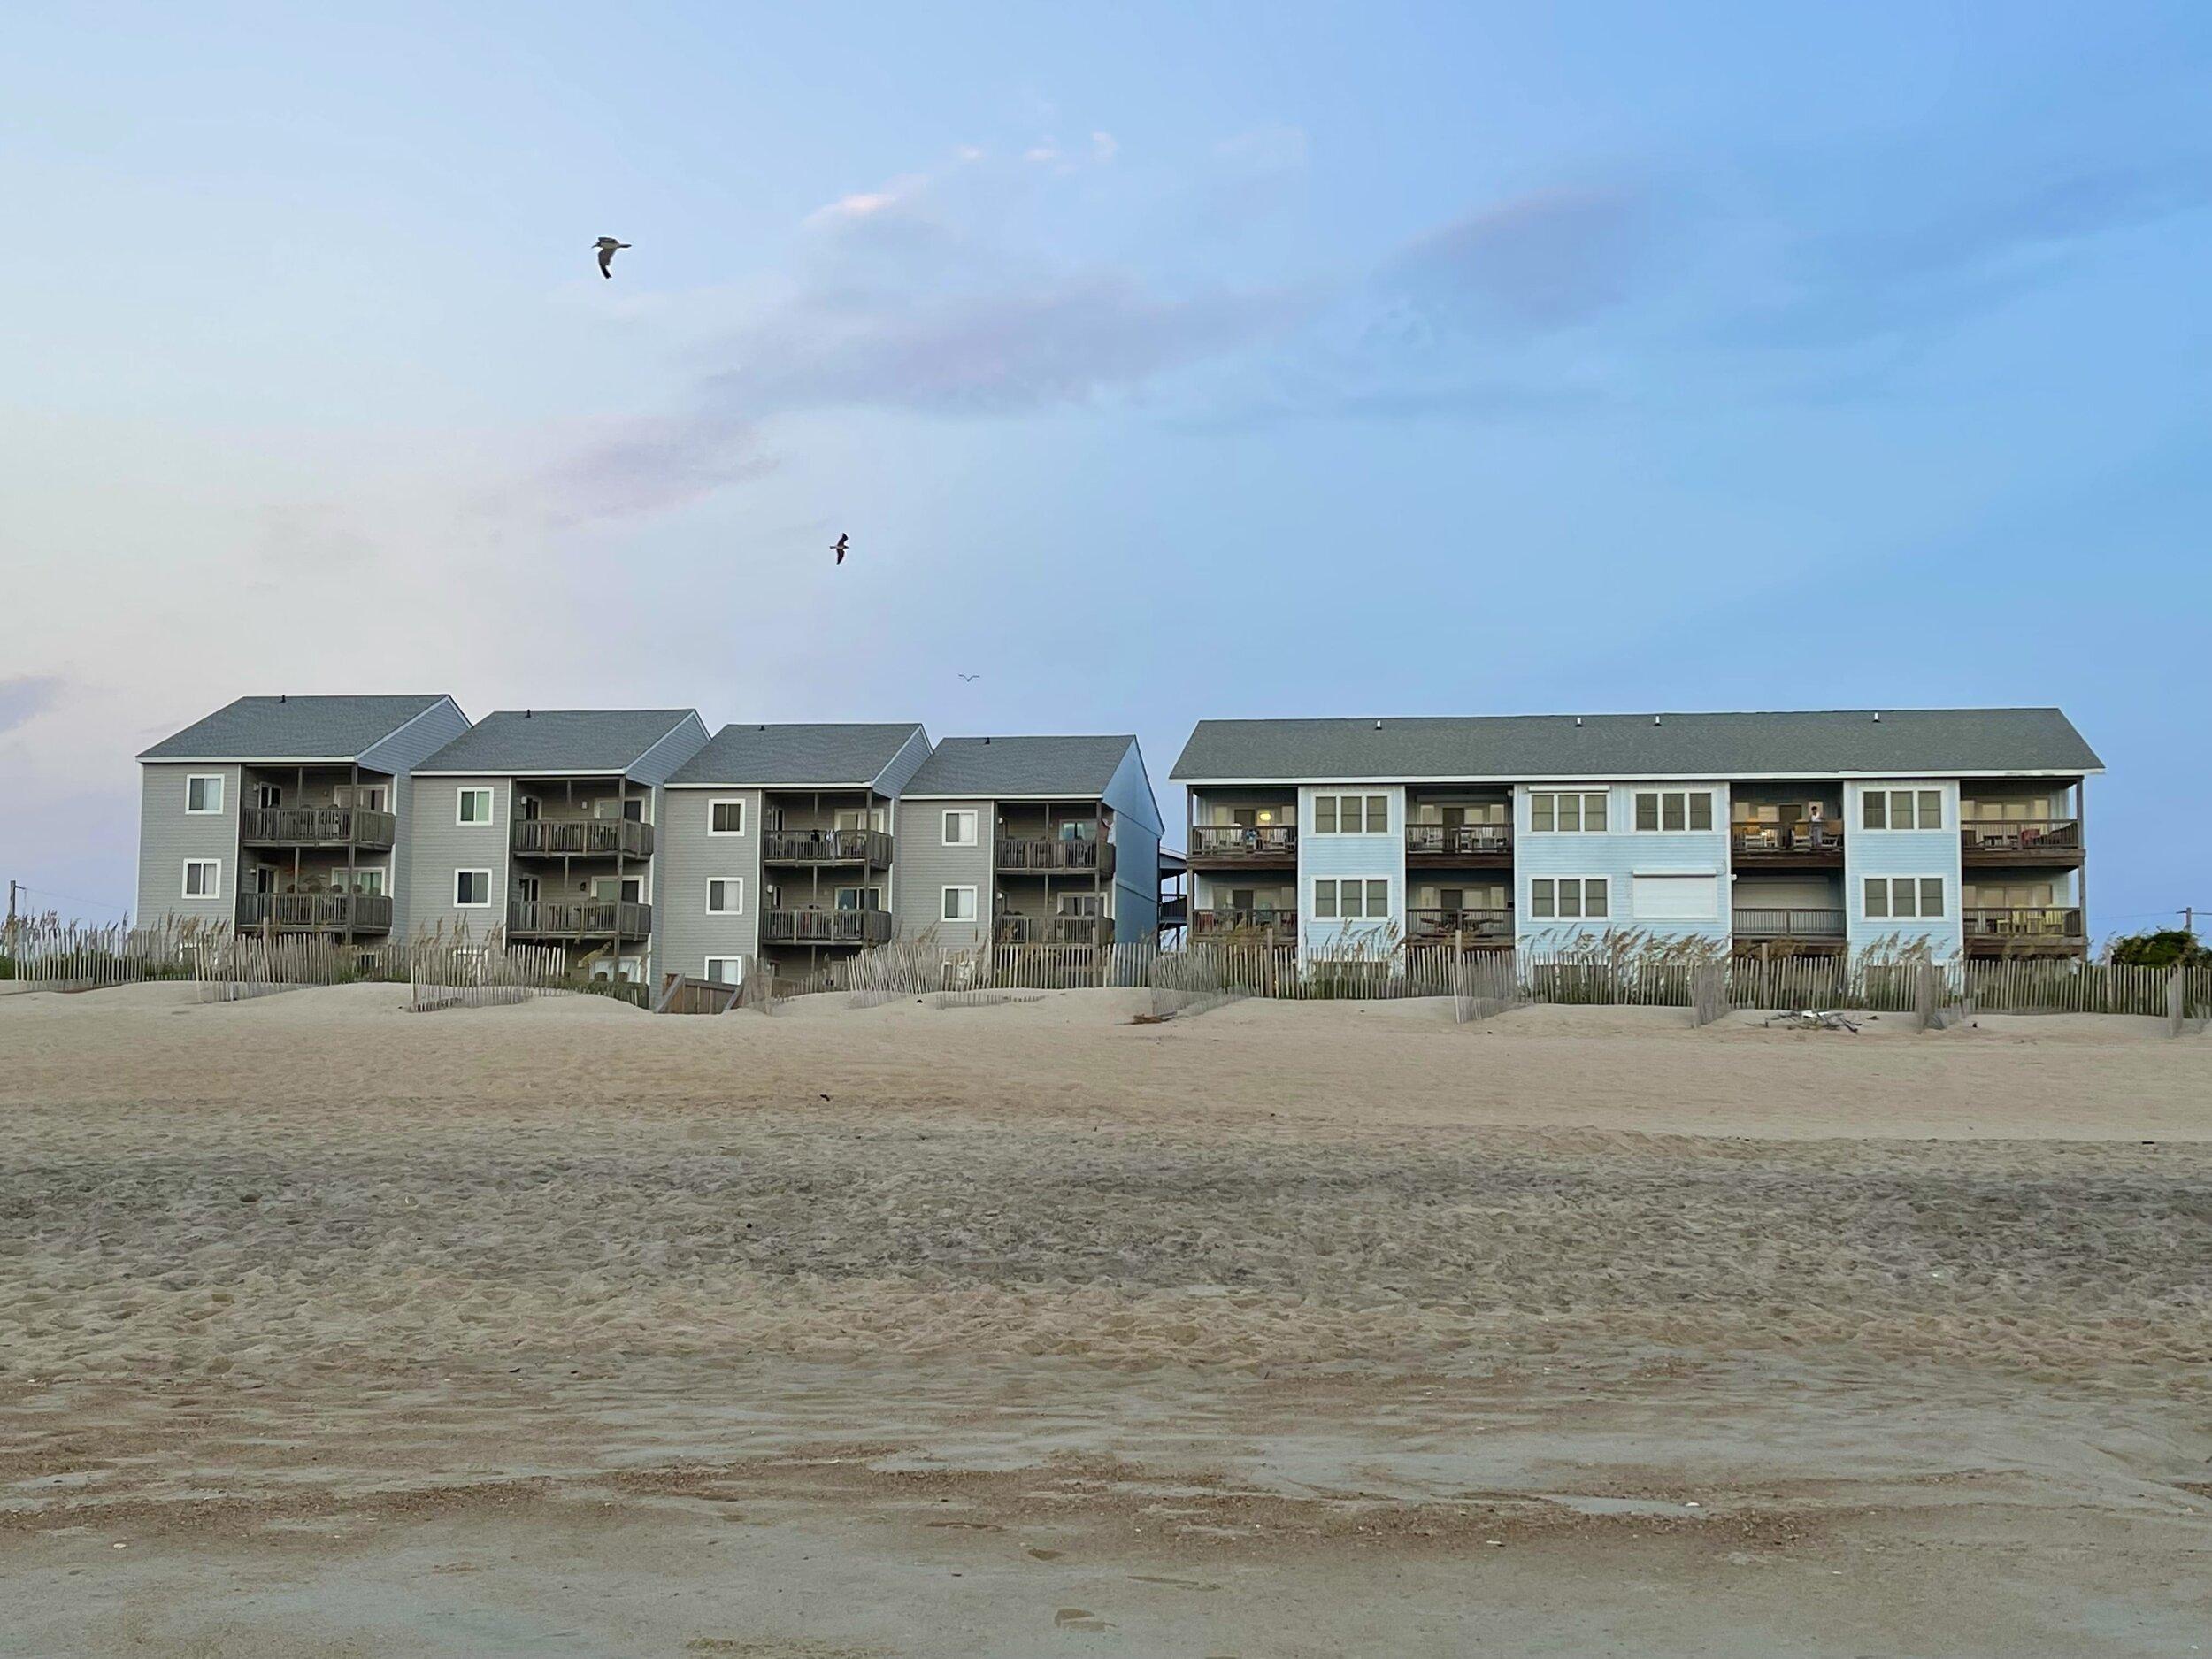 Our Outer Banks condo rental